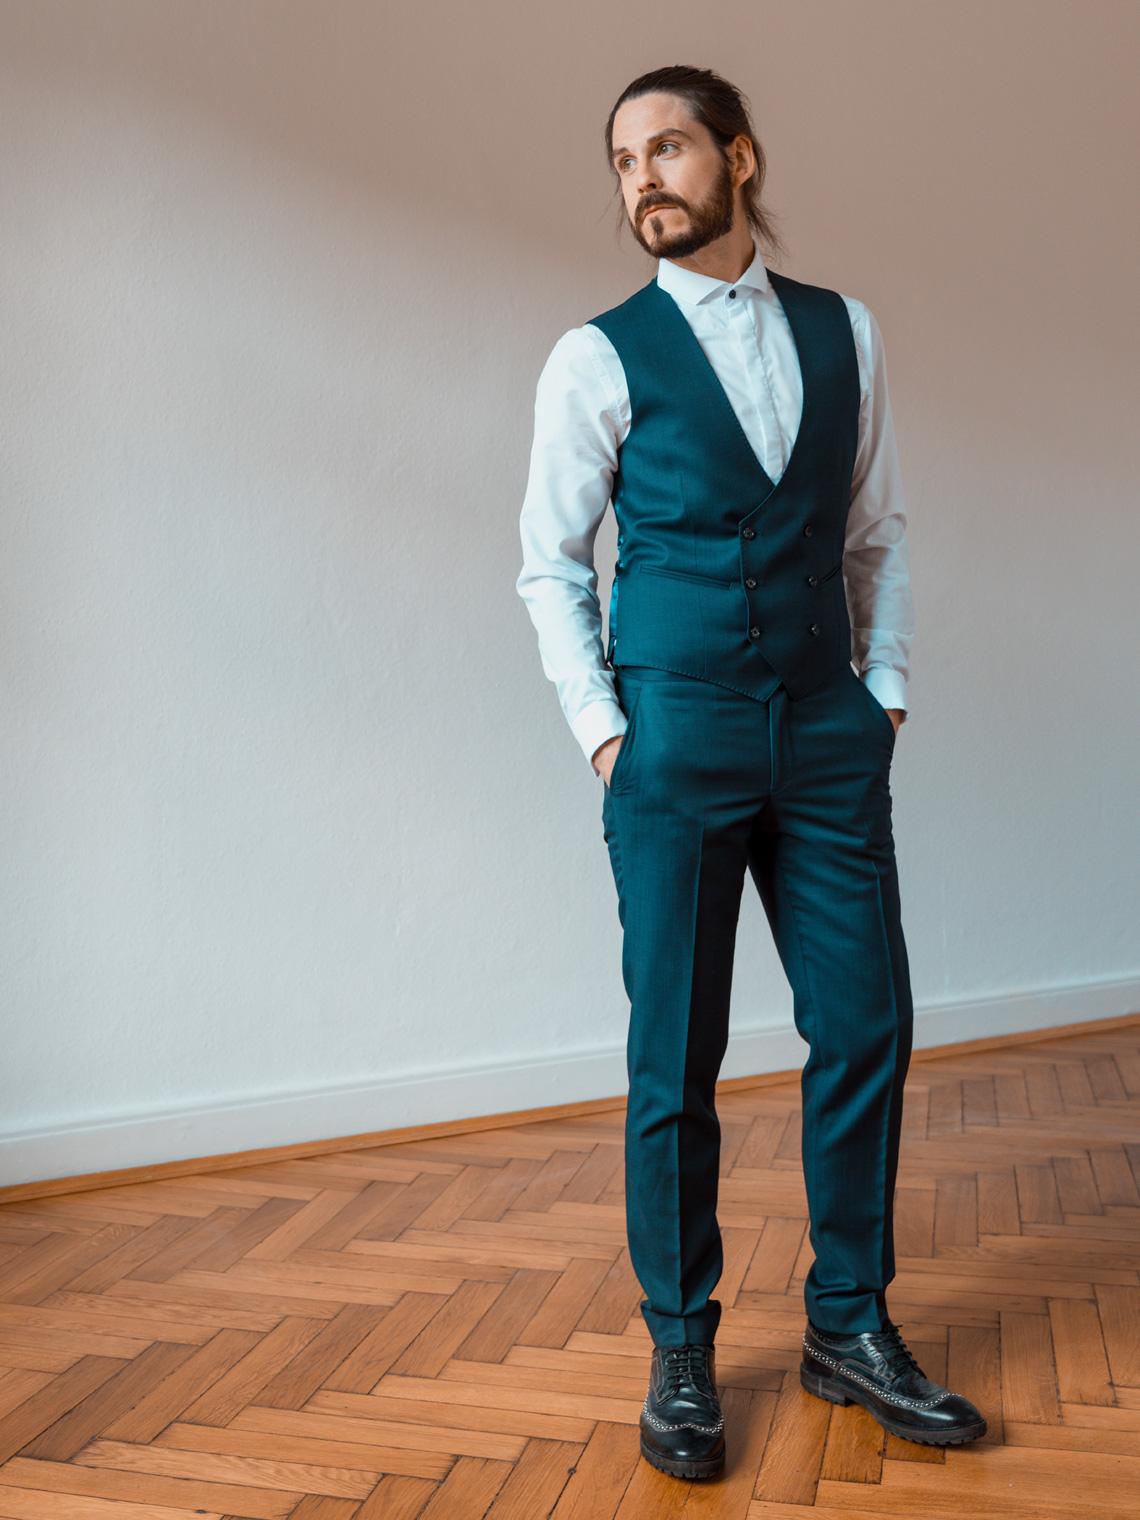 Männermodeblog-Kaisers-neue-Kleider-Anzug-Maßanfertigung-The-Bloke-Fliege-Weste-Dapper-Style